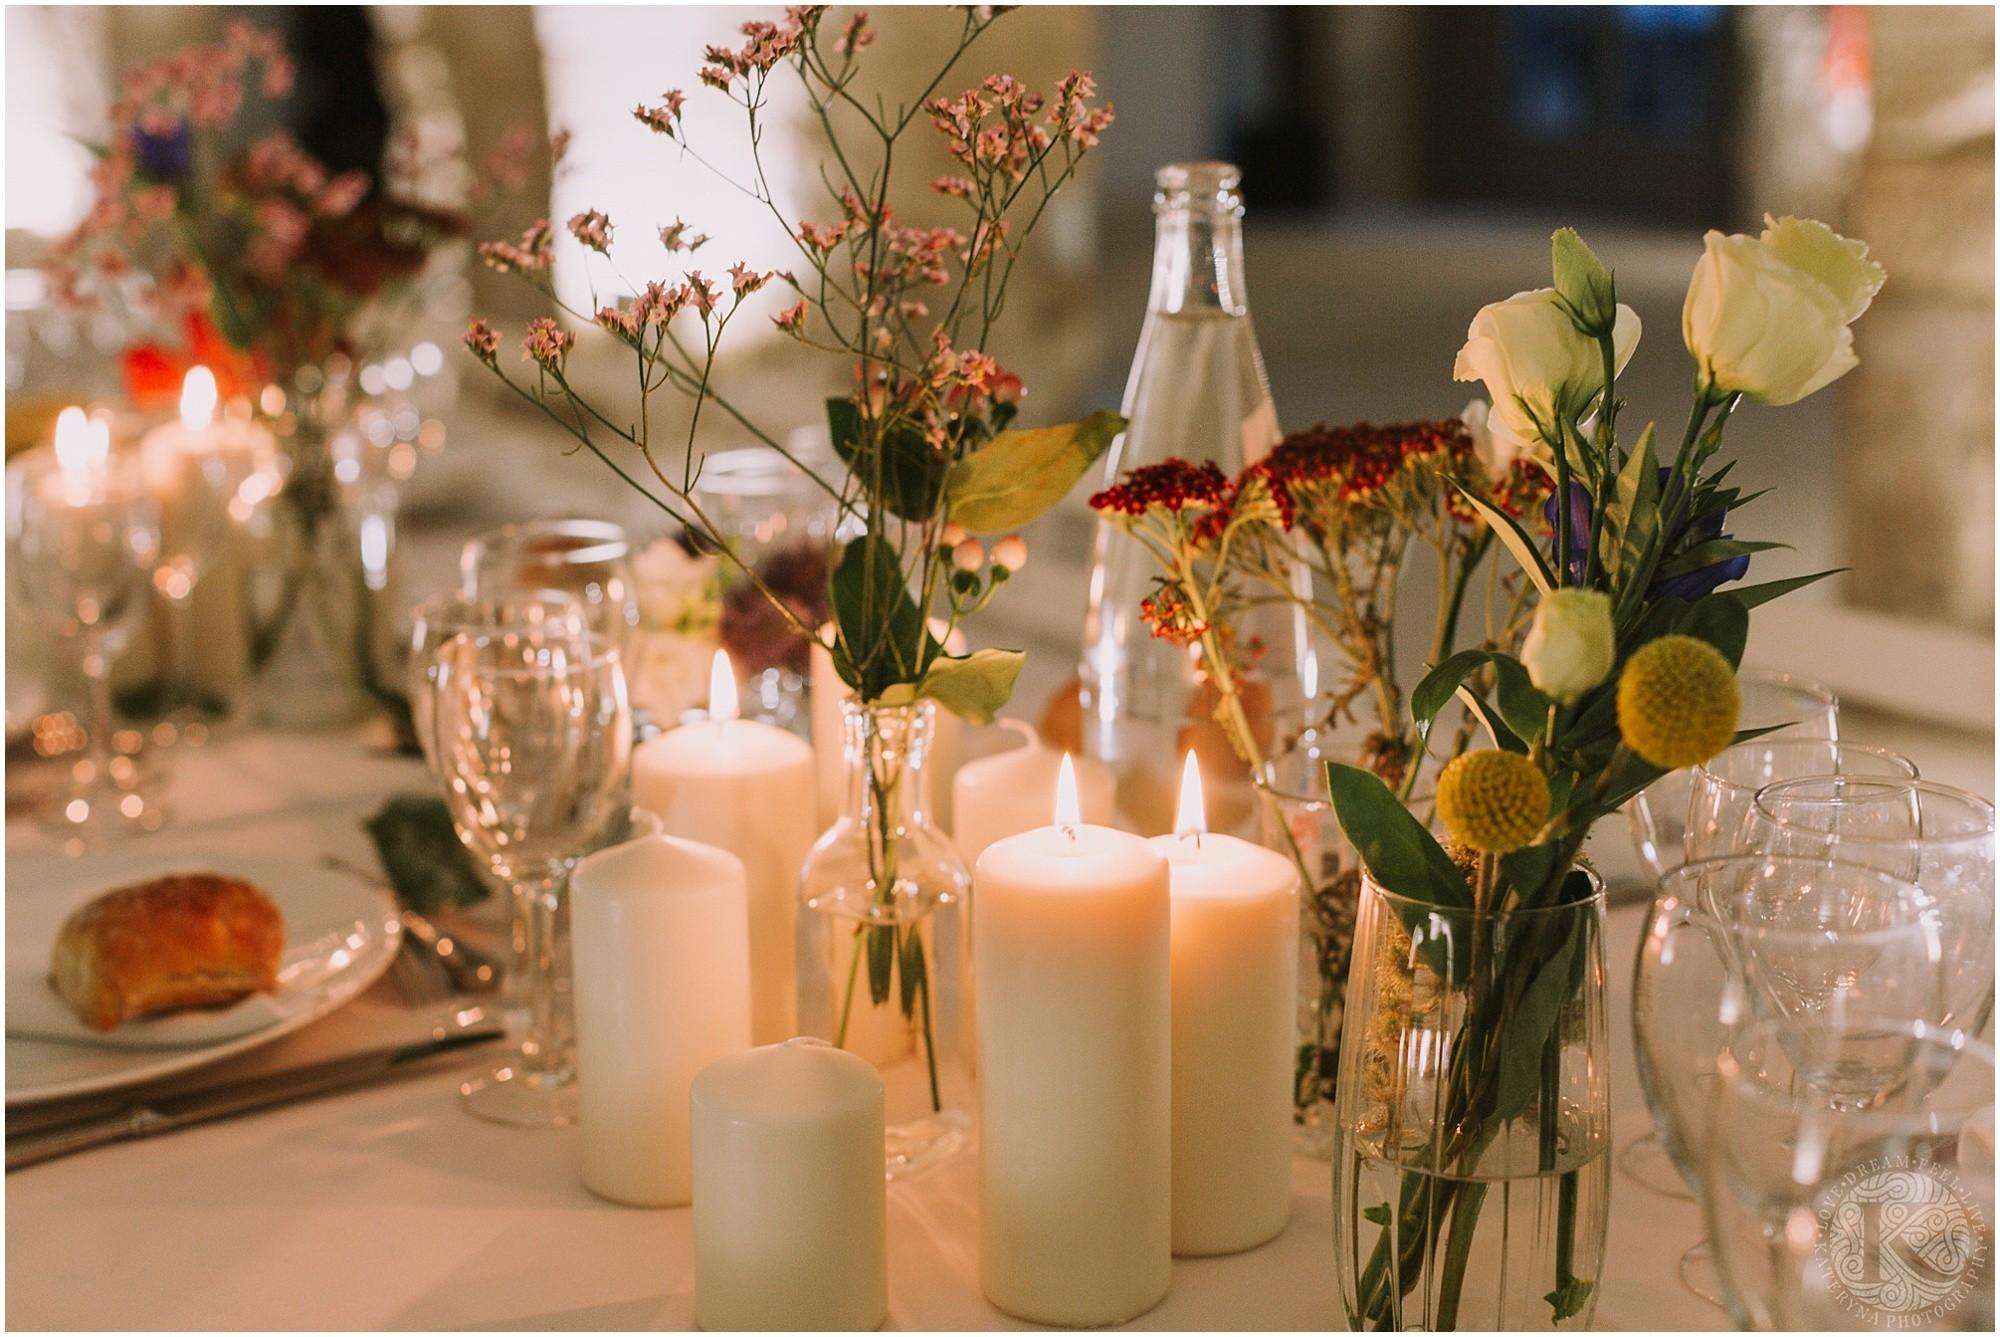 Kateryna-photos-photographe-mariage-vaucluse-provence-avignon-ferme-st-hugues_0091.jpg